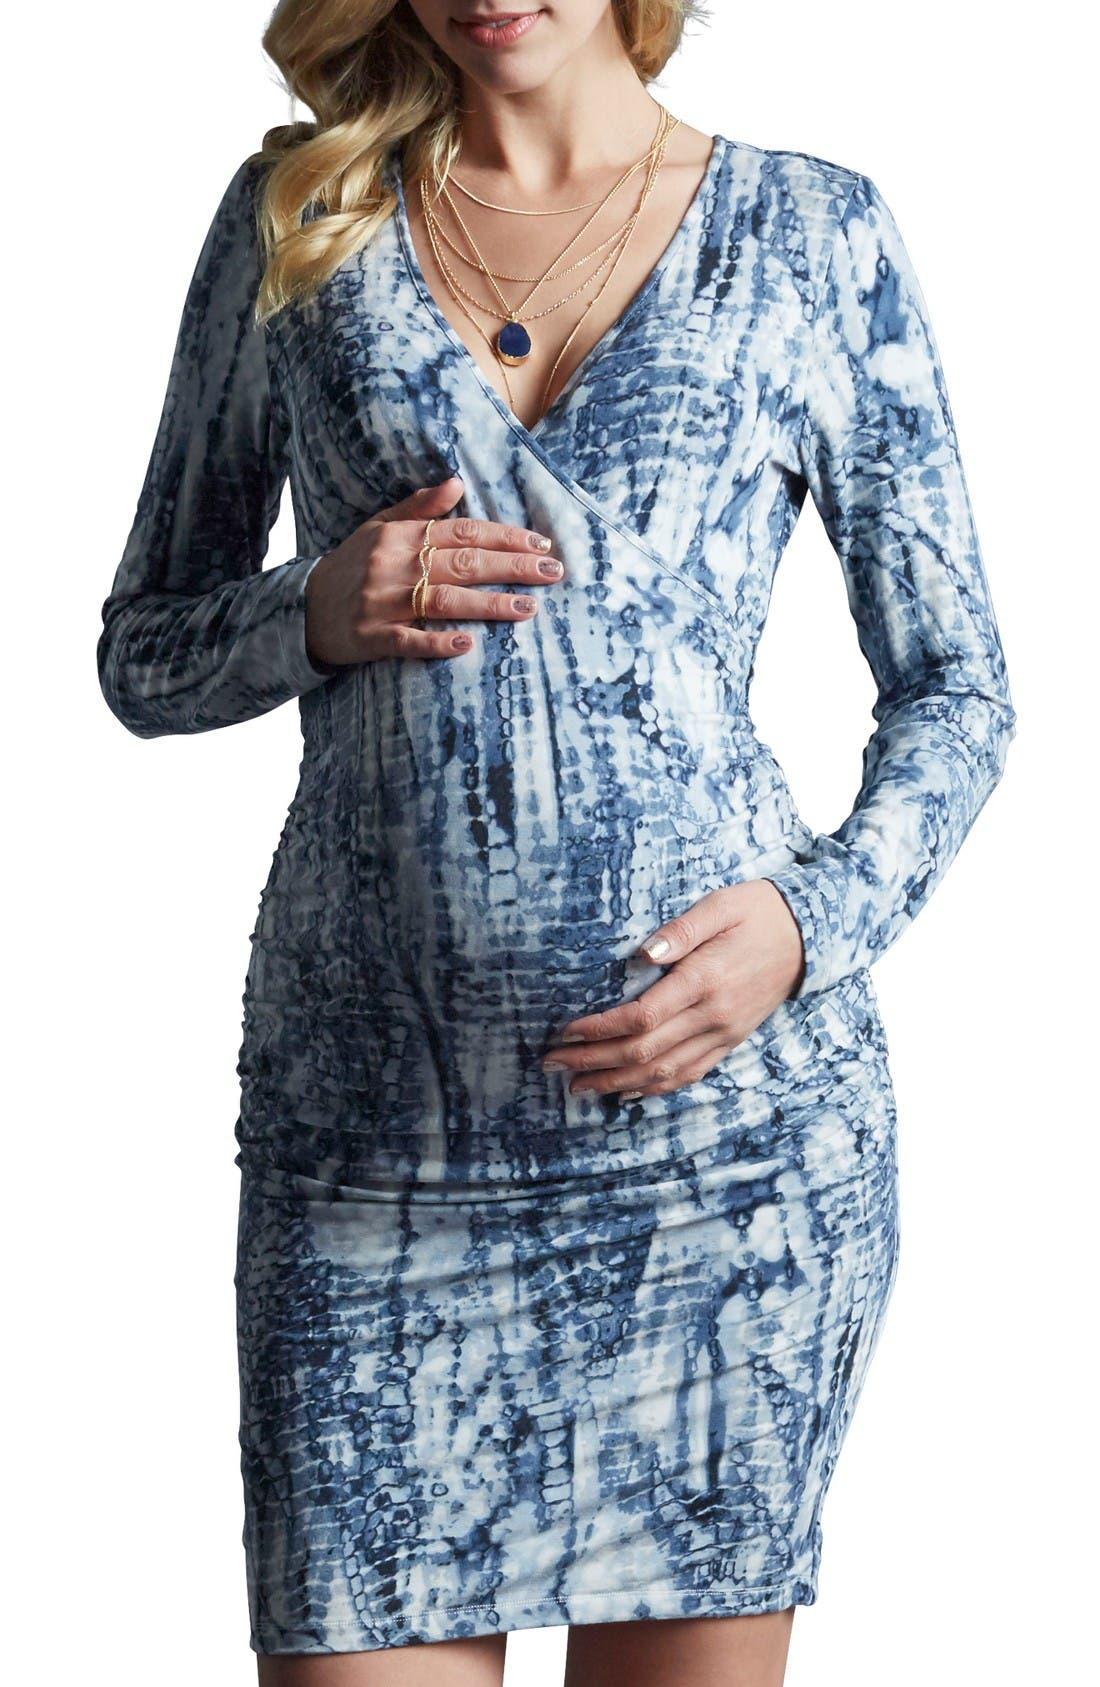 Tart 'Peaches' Maternity Body-Con Dress